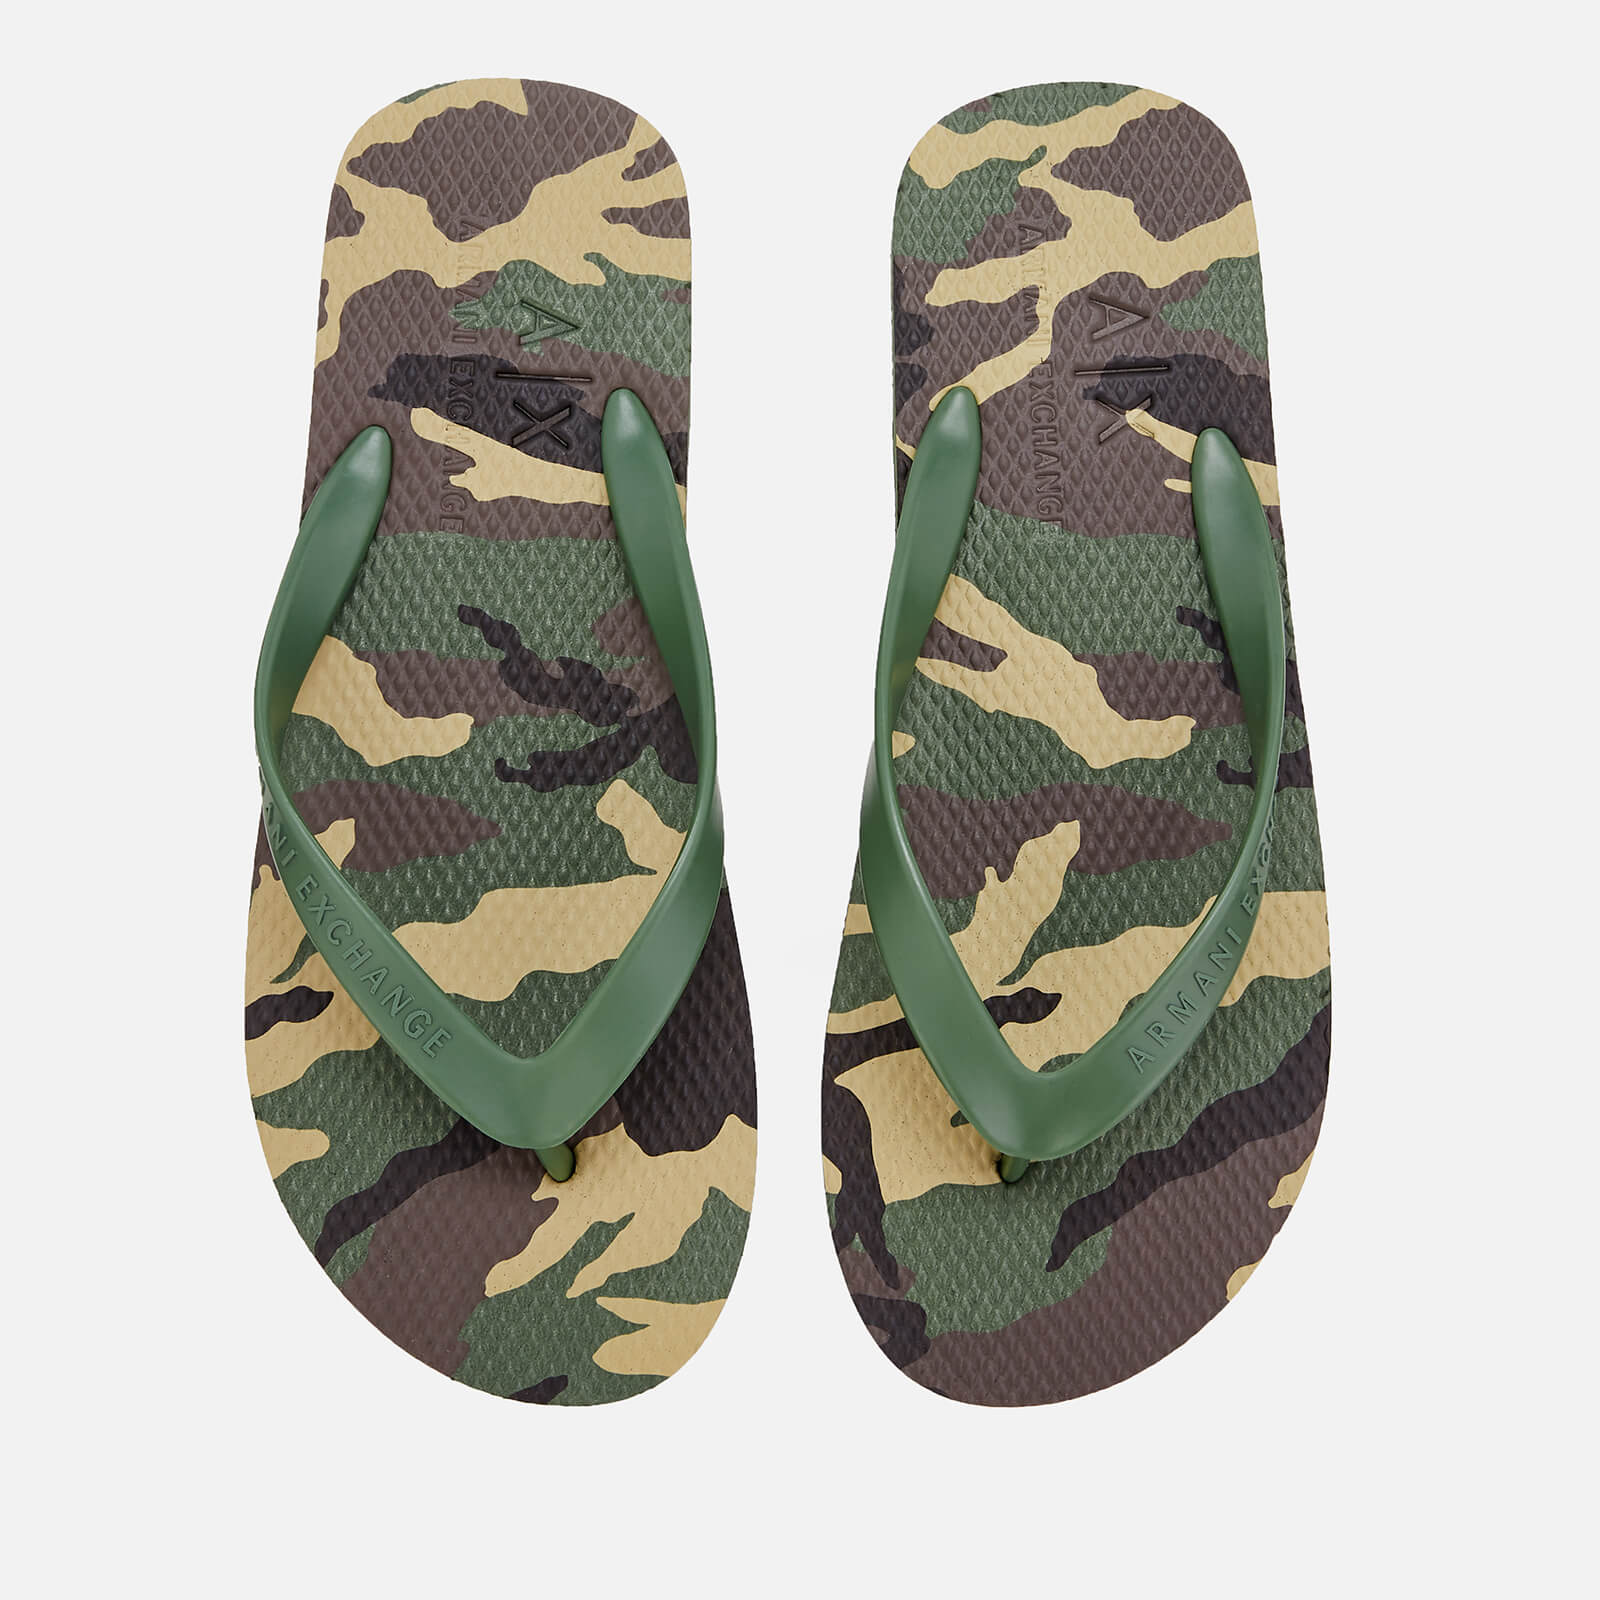 bbaff7c0b Armani Exchange Men s Printed Flip Flops - Military Green